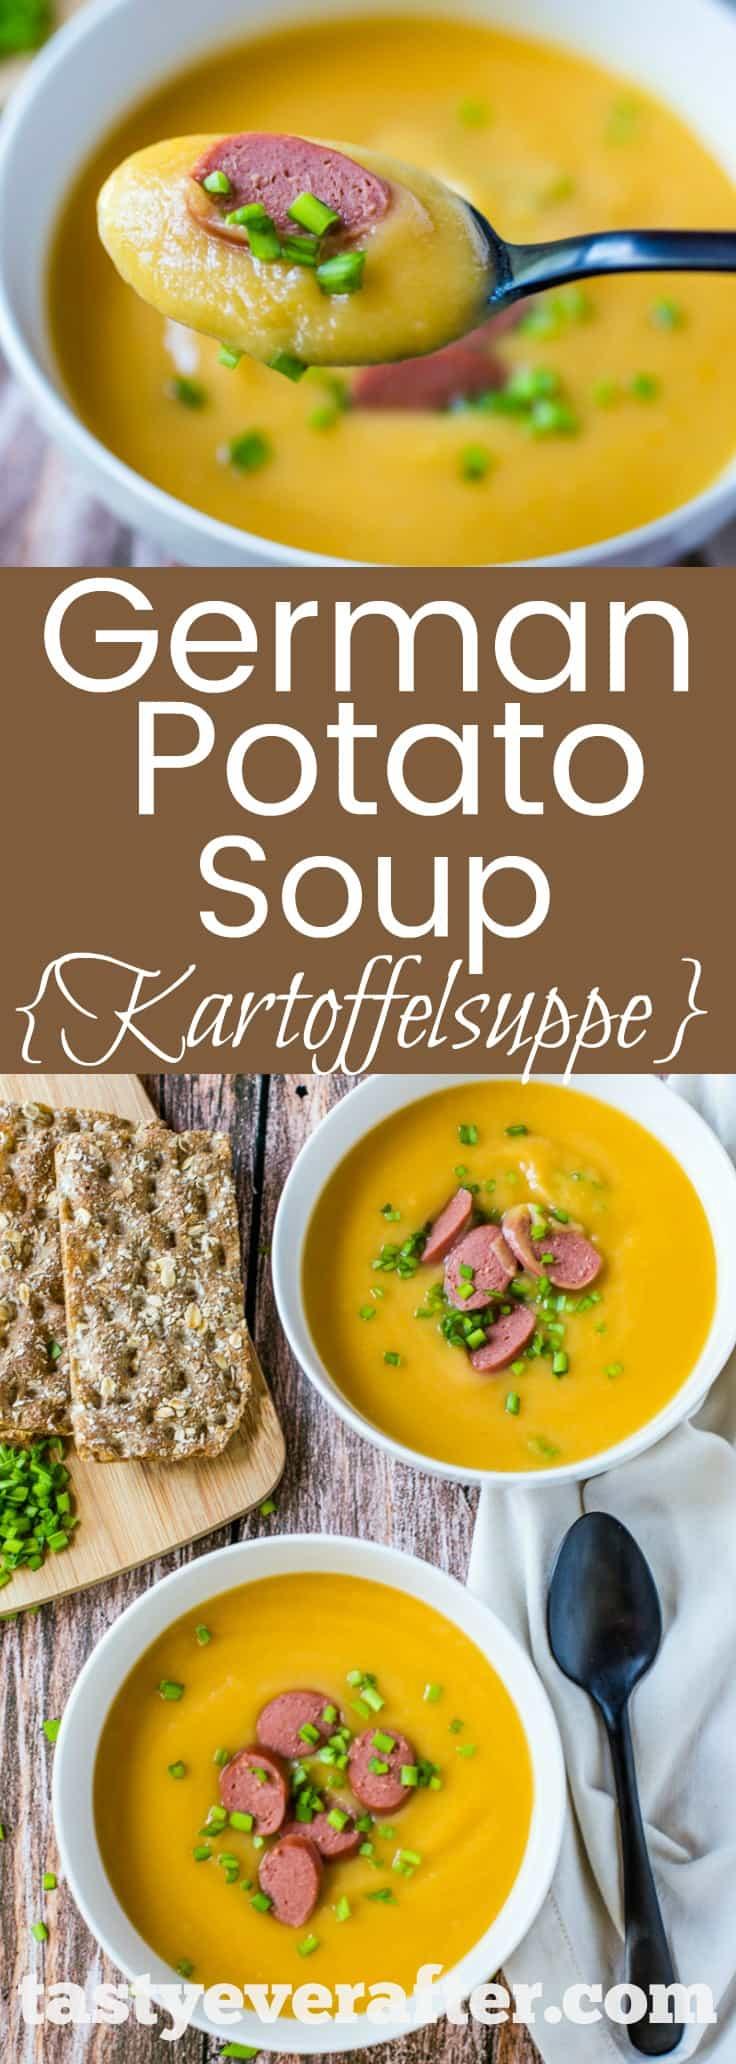 German Potato Soup {Kartoffelsuppe} Recipe